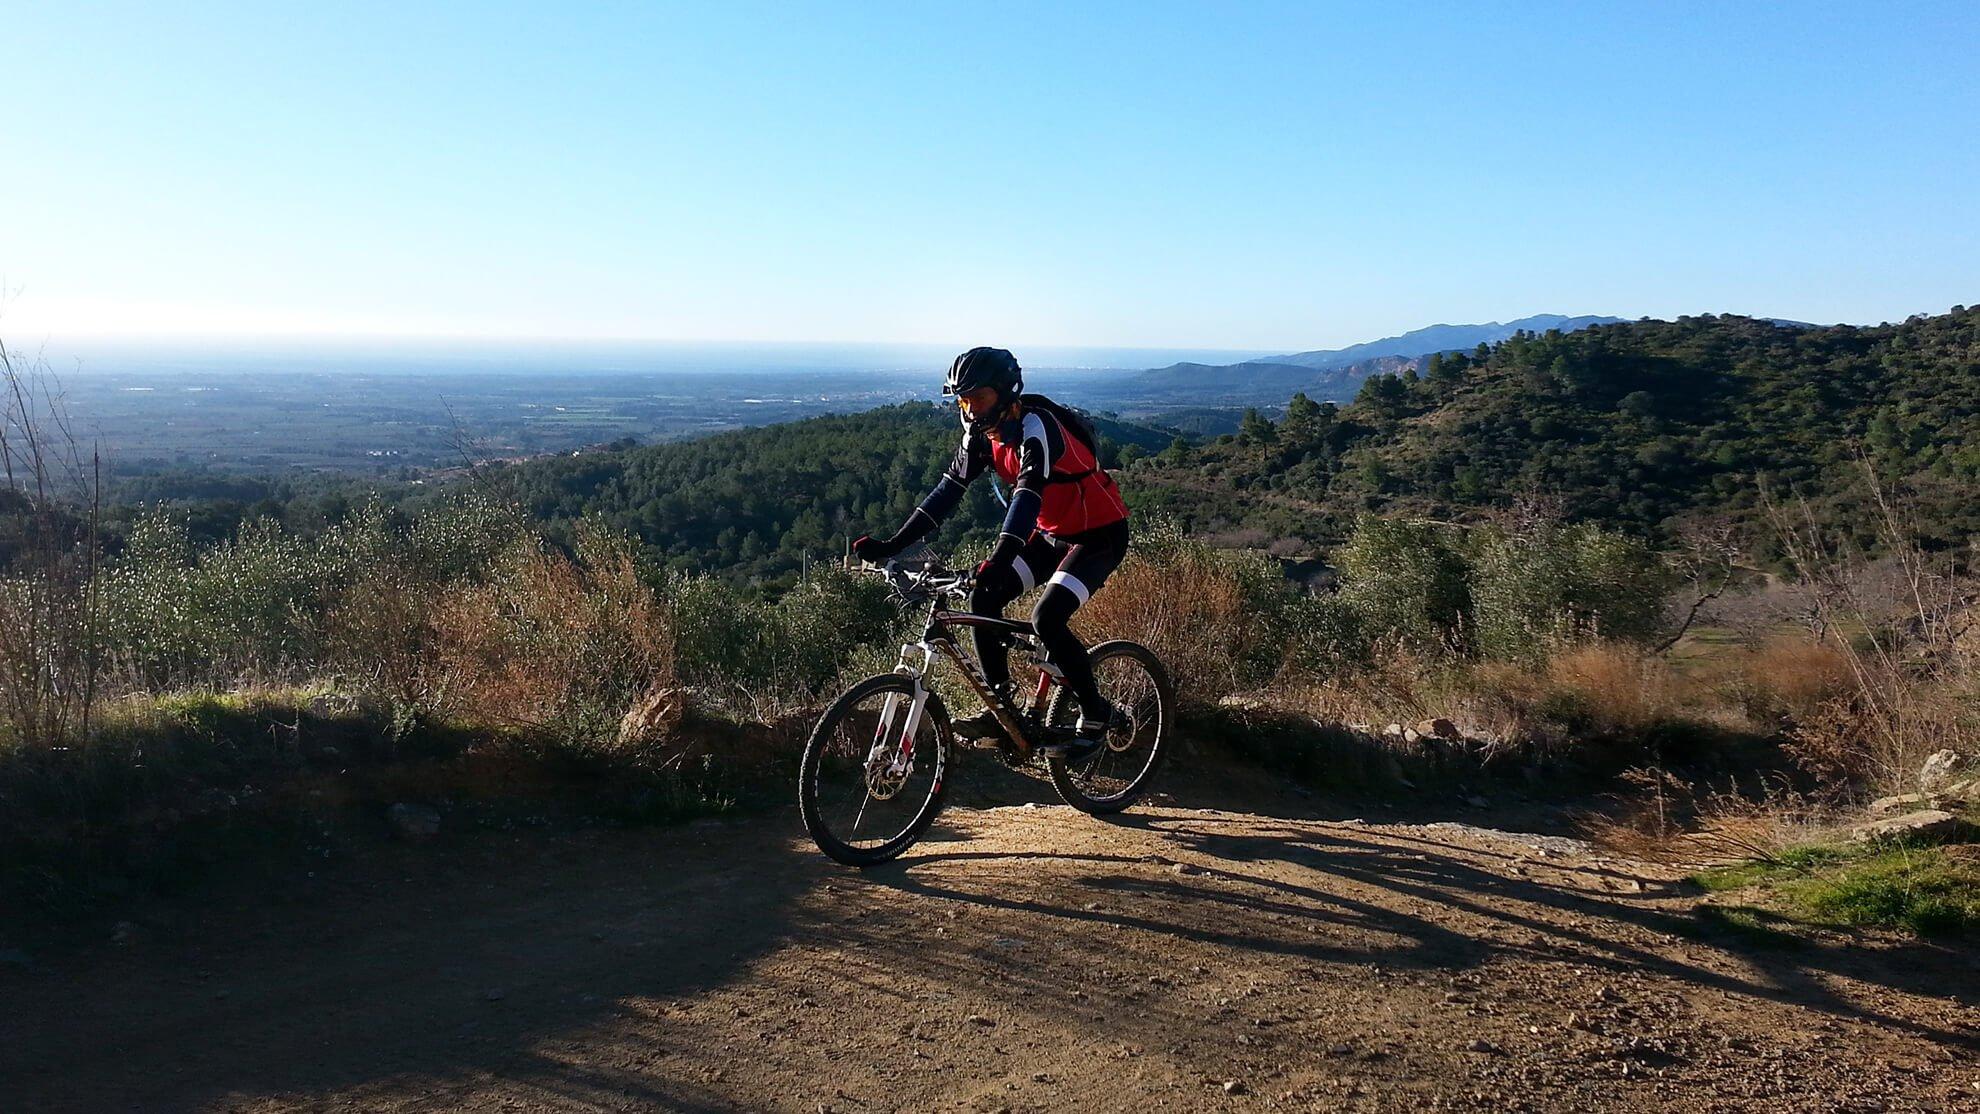 Mountainbike routes in Baix Camp, Gran Fondo Priorat